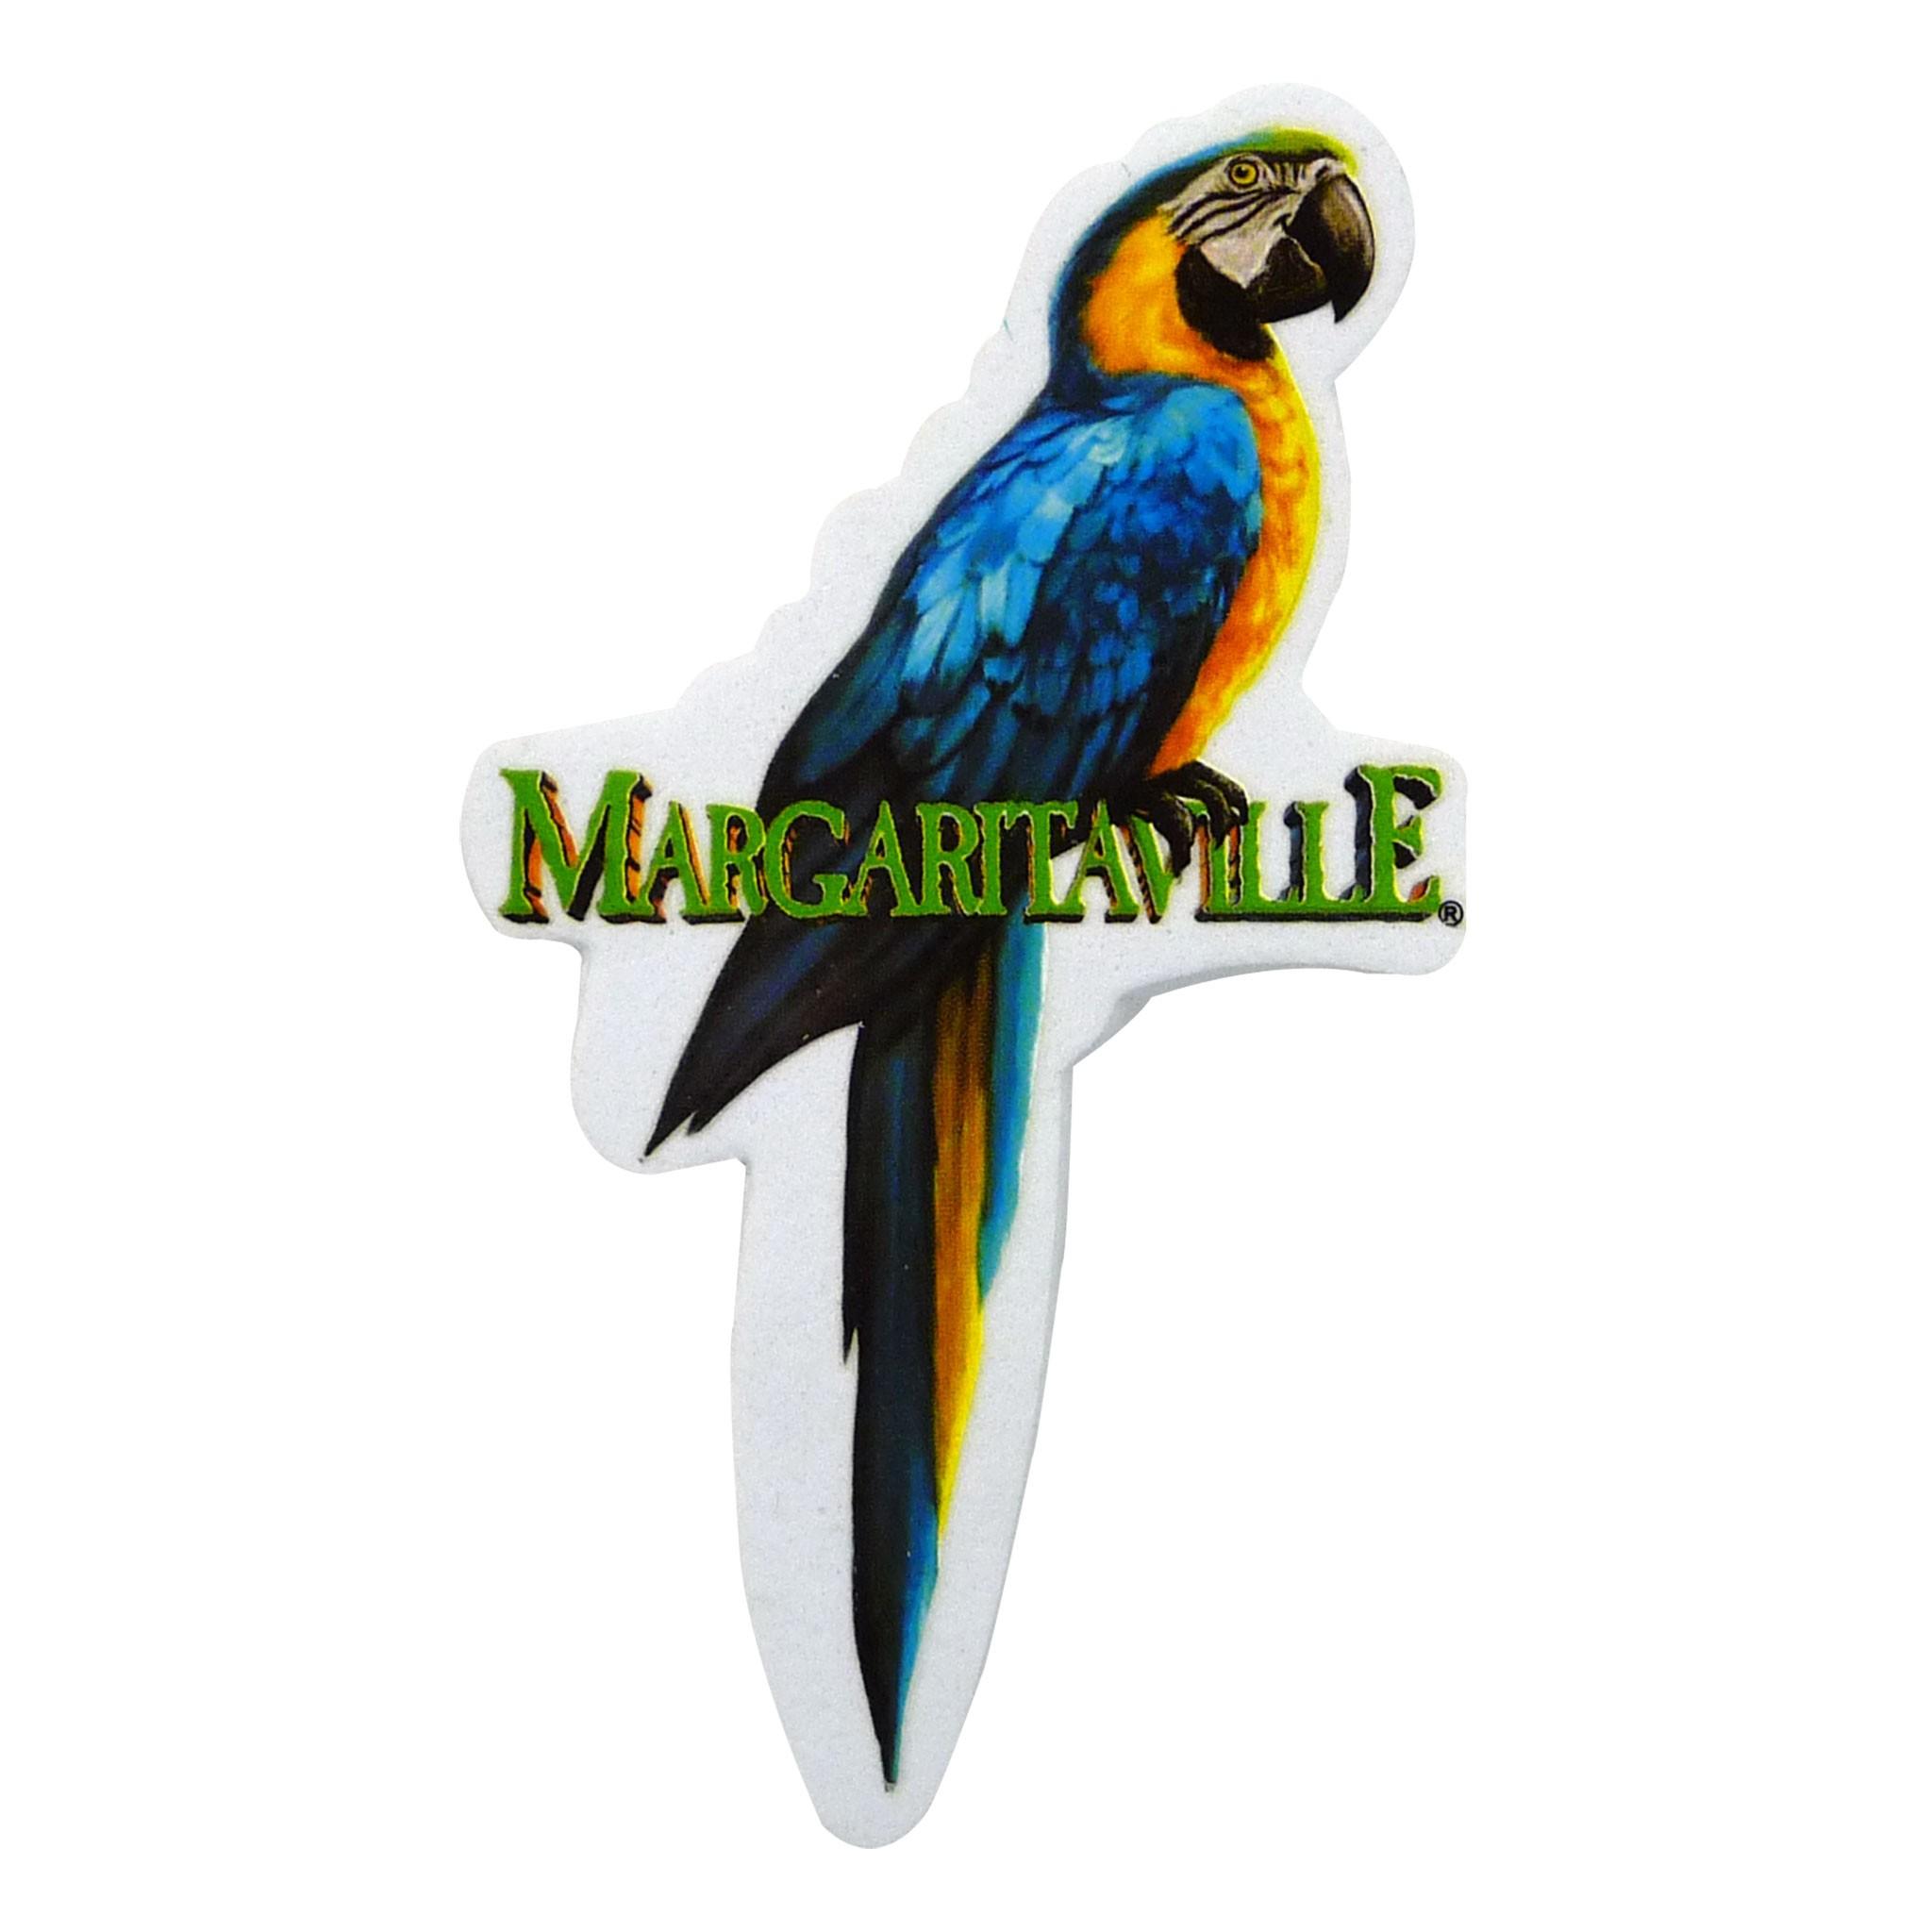 Margaritaville Parrot - Bing images